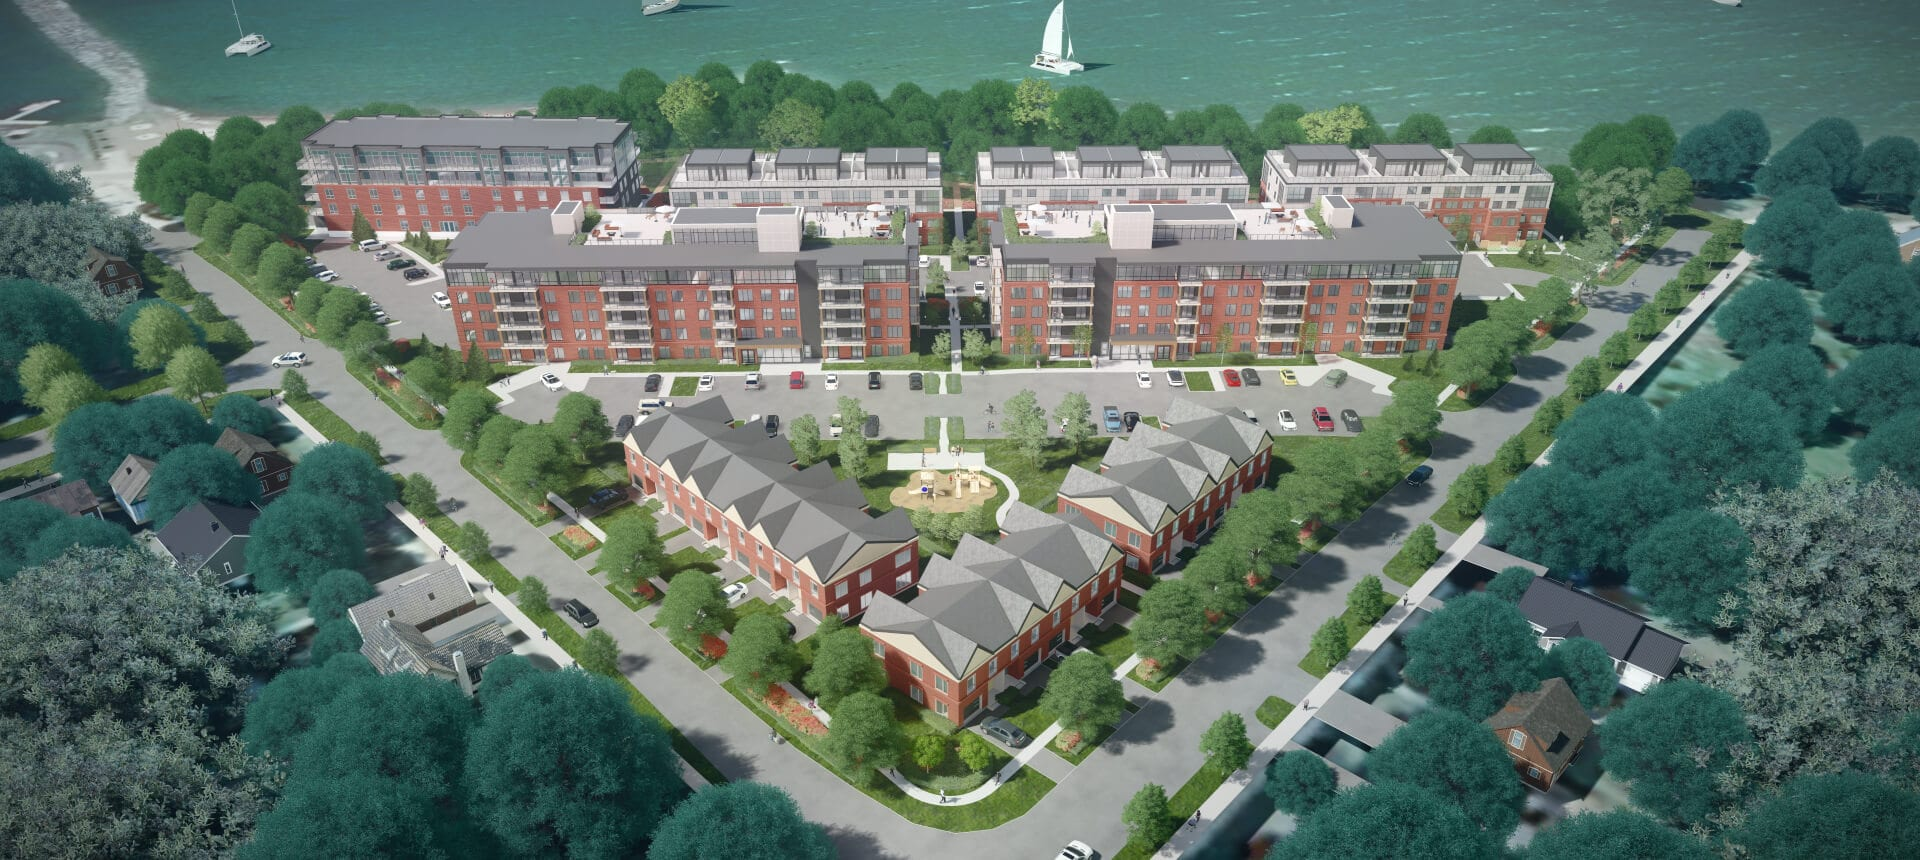 SkyDev Development Meaford - Property Rendering